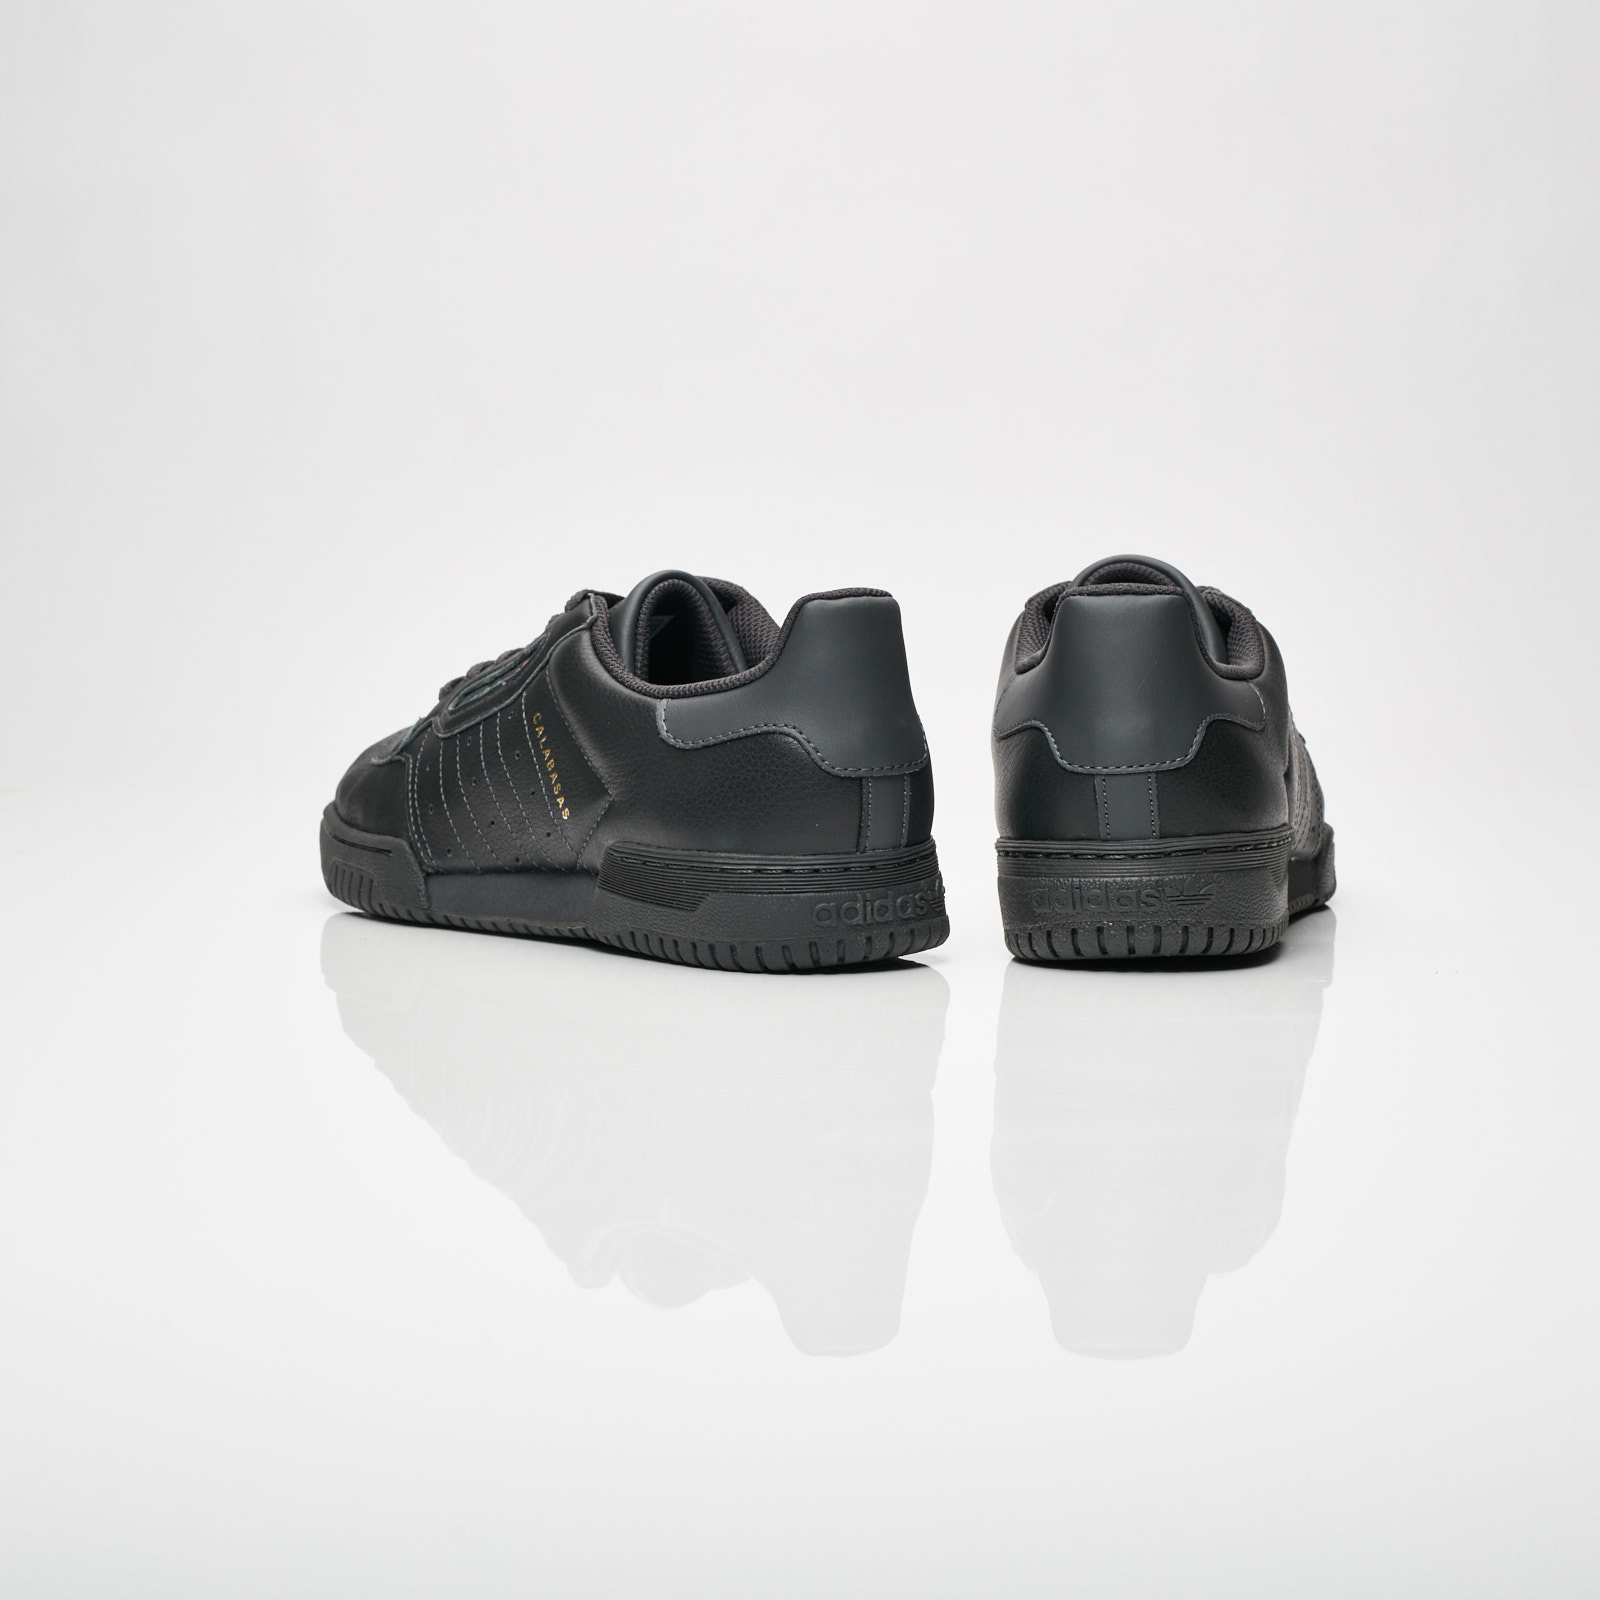 4988fbb76ab ... adidas Originals x Kanye West Yeezy Powerphase ...